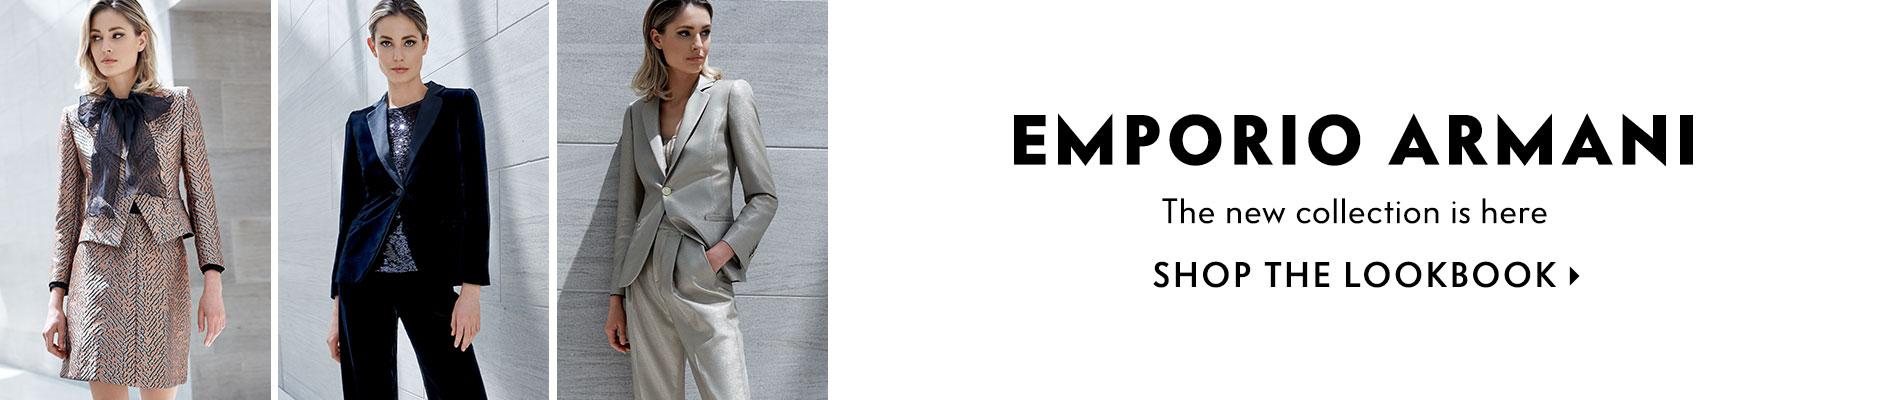 Emporio Armani Women\'s Clothing at Neiman Marcus